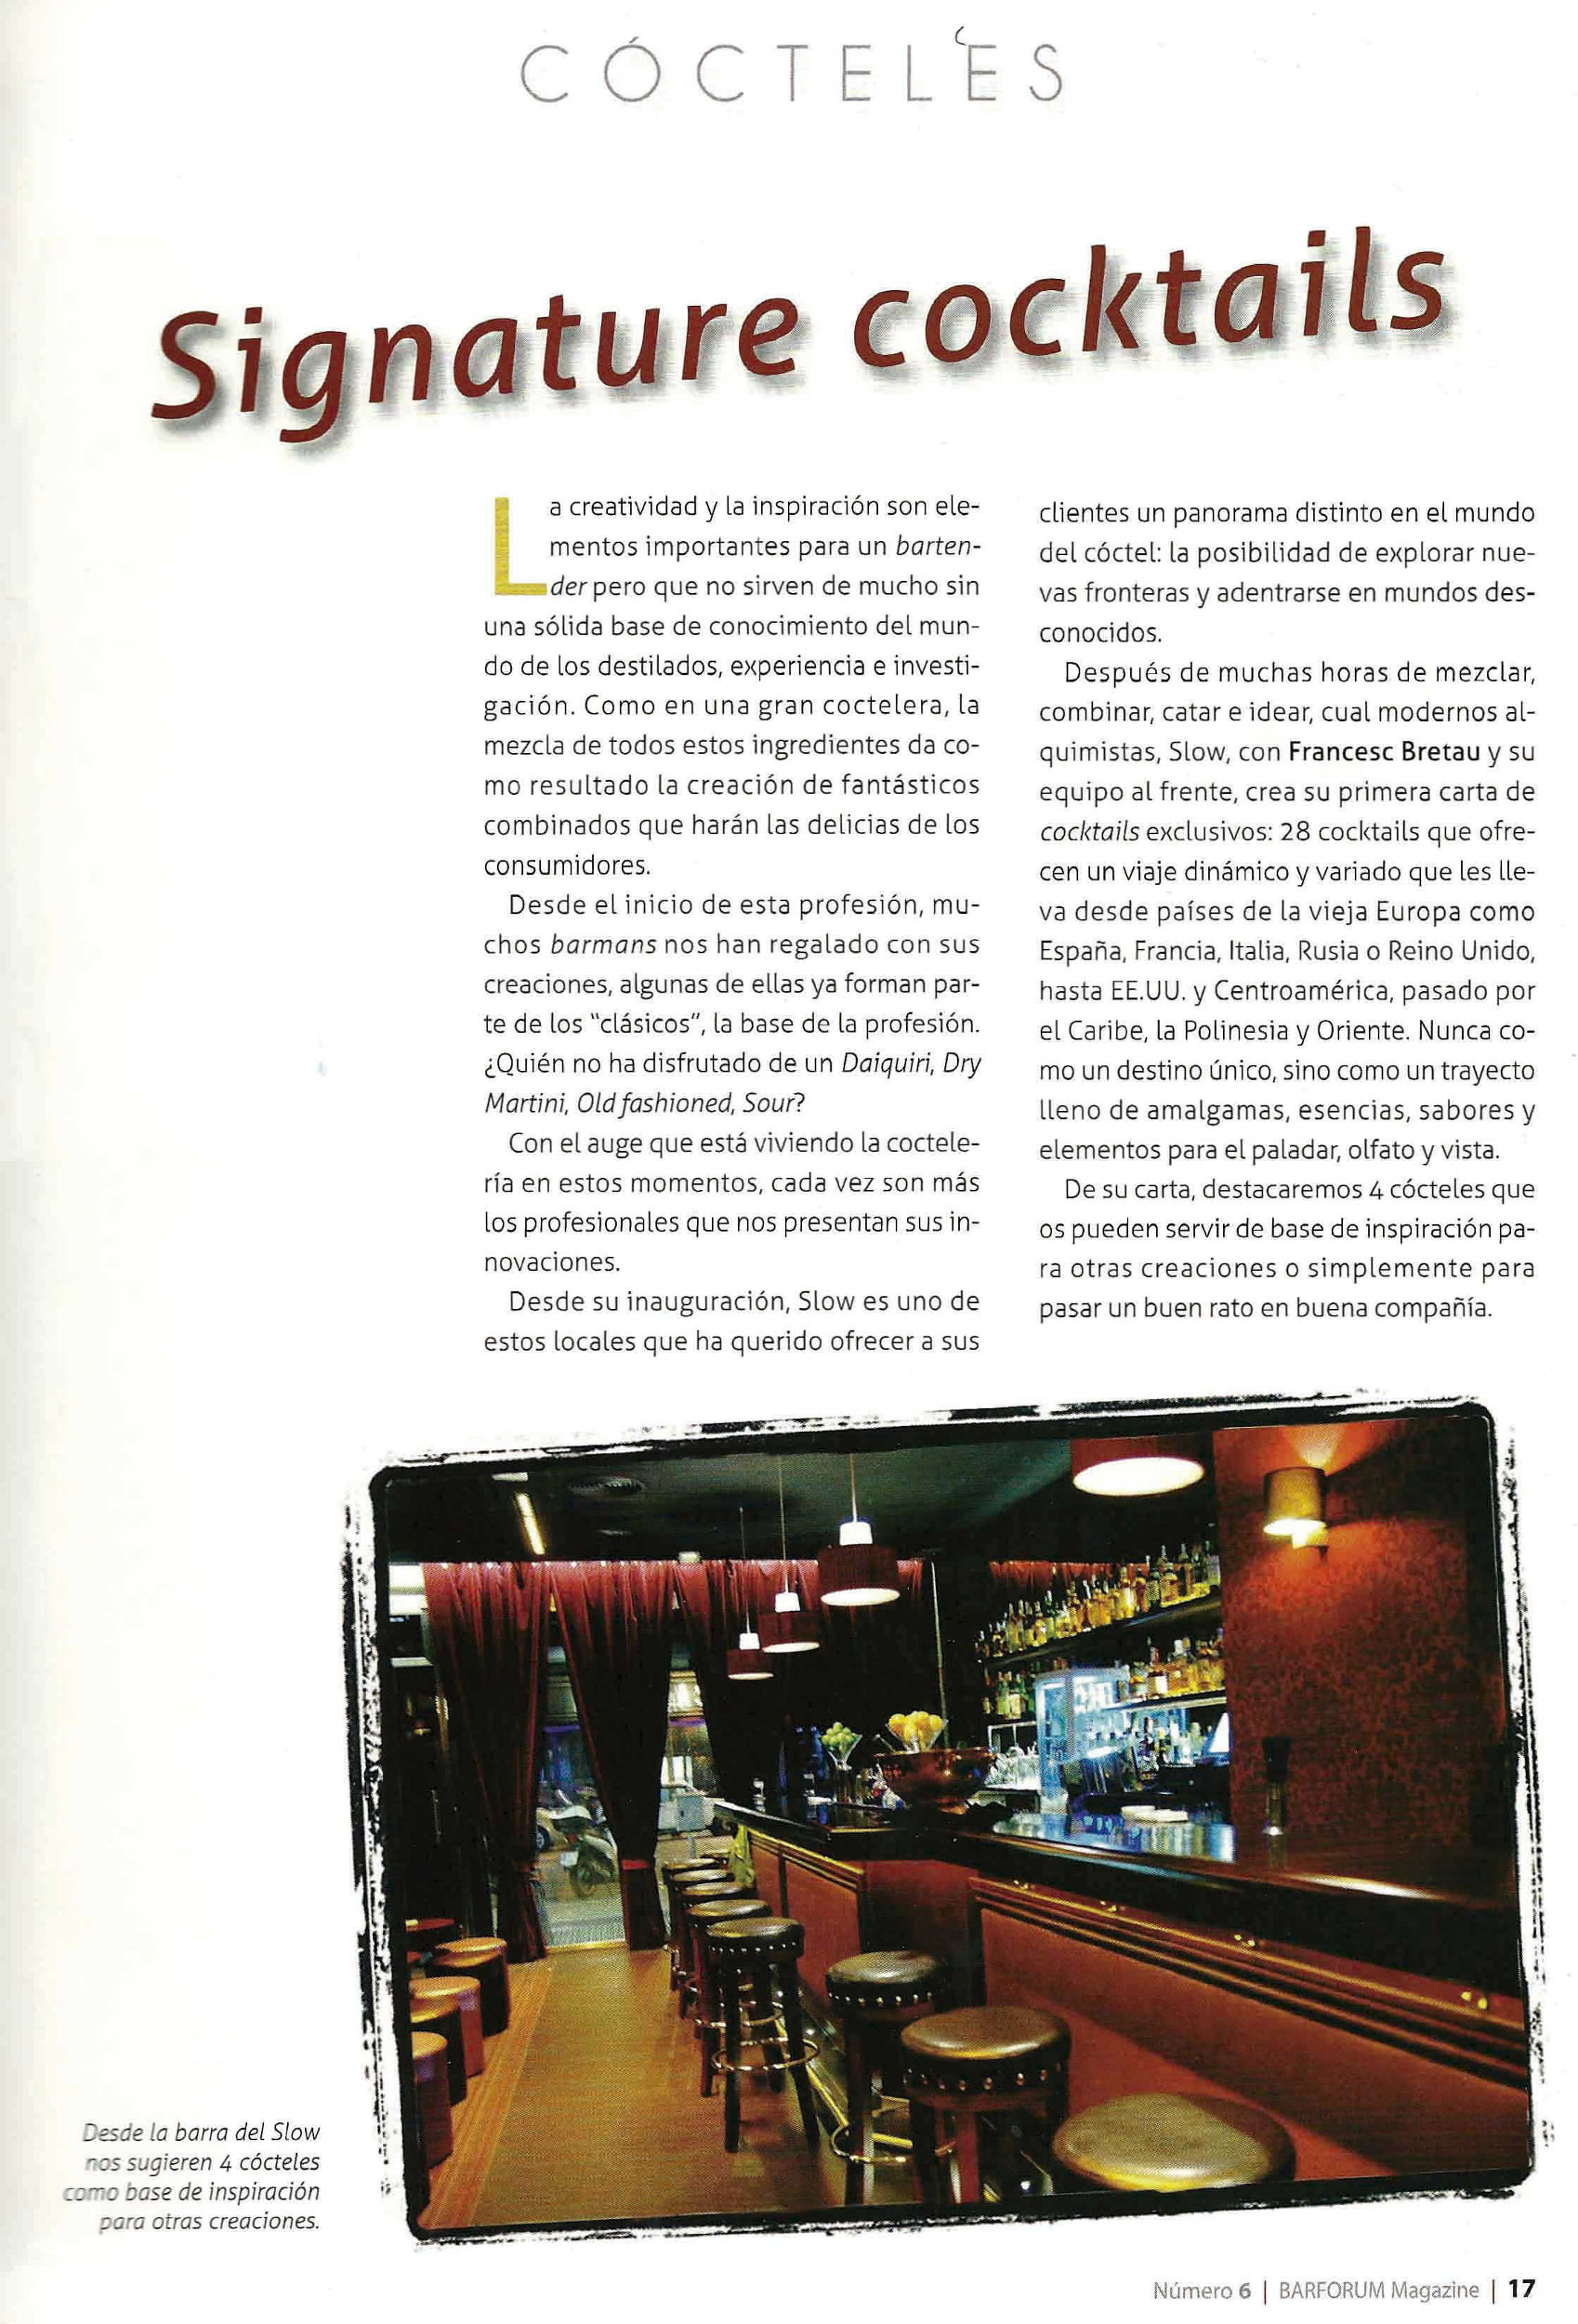 Barforum Magazine alaba nuestra labor!